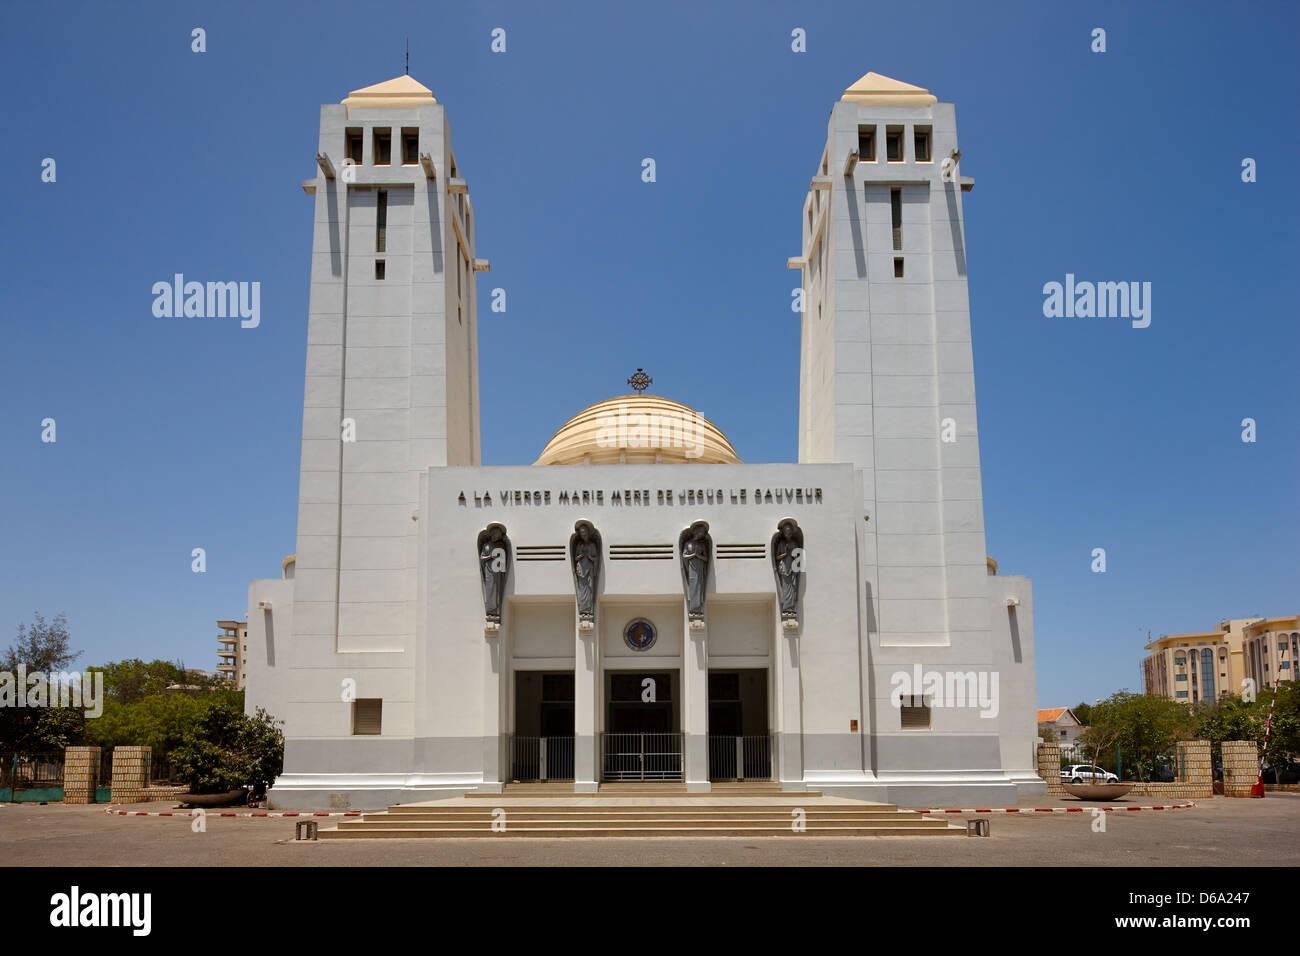 La catedral de Dakar, Senegal, África Imagen De Stock